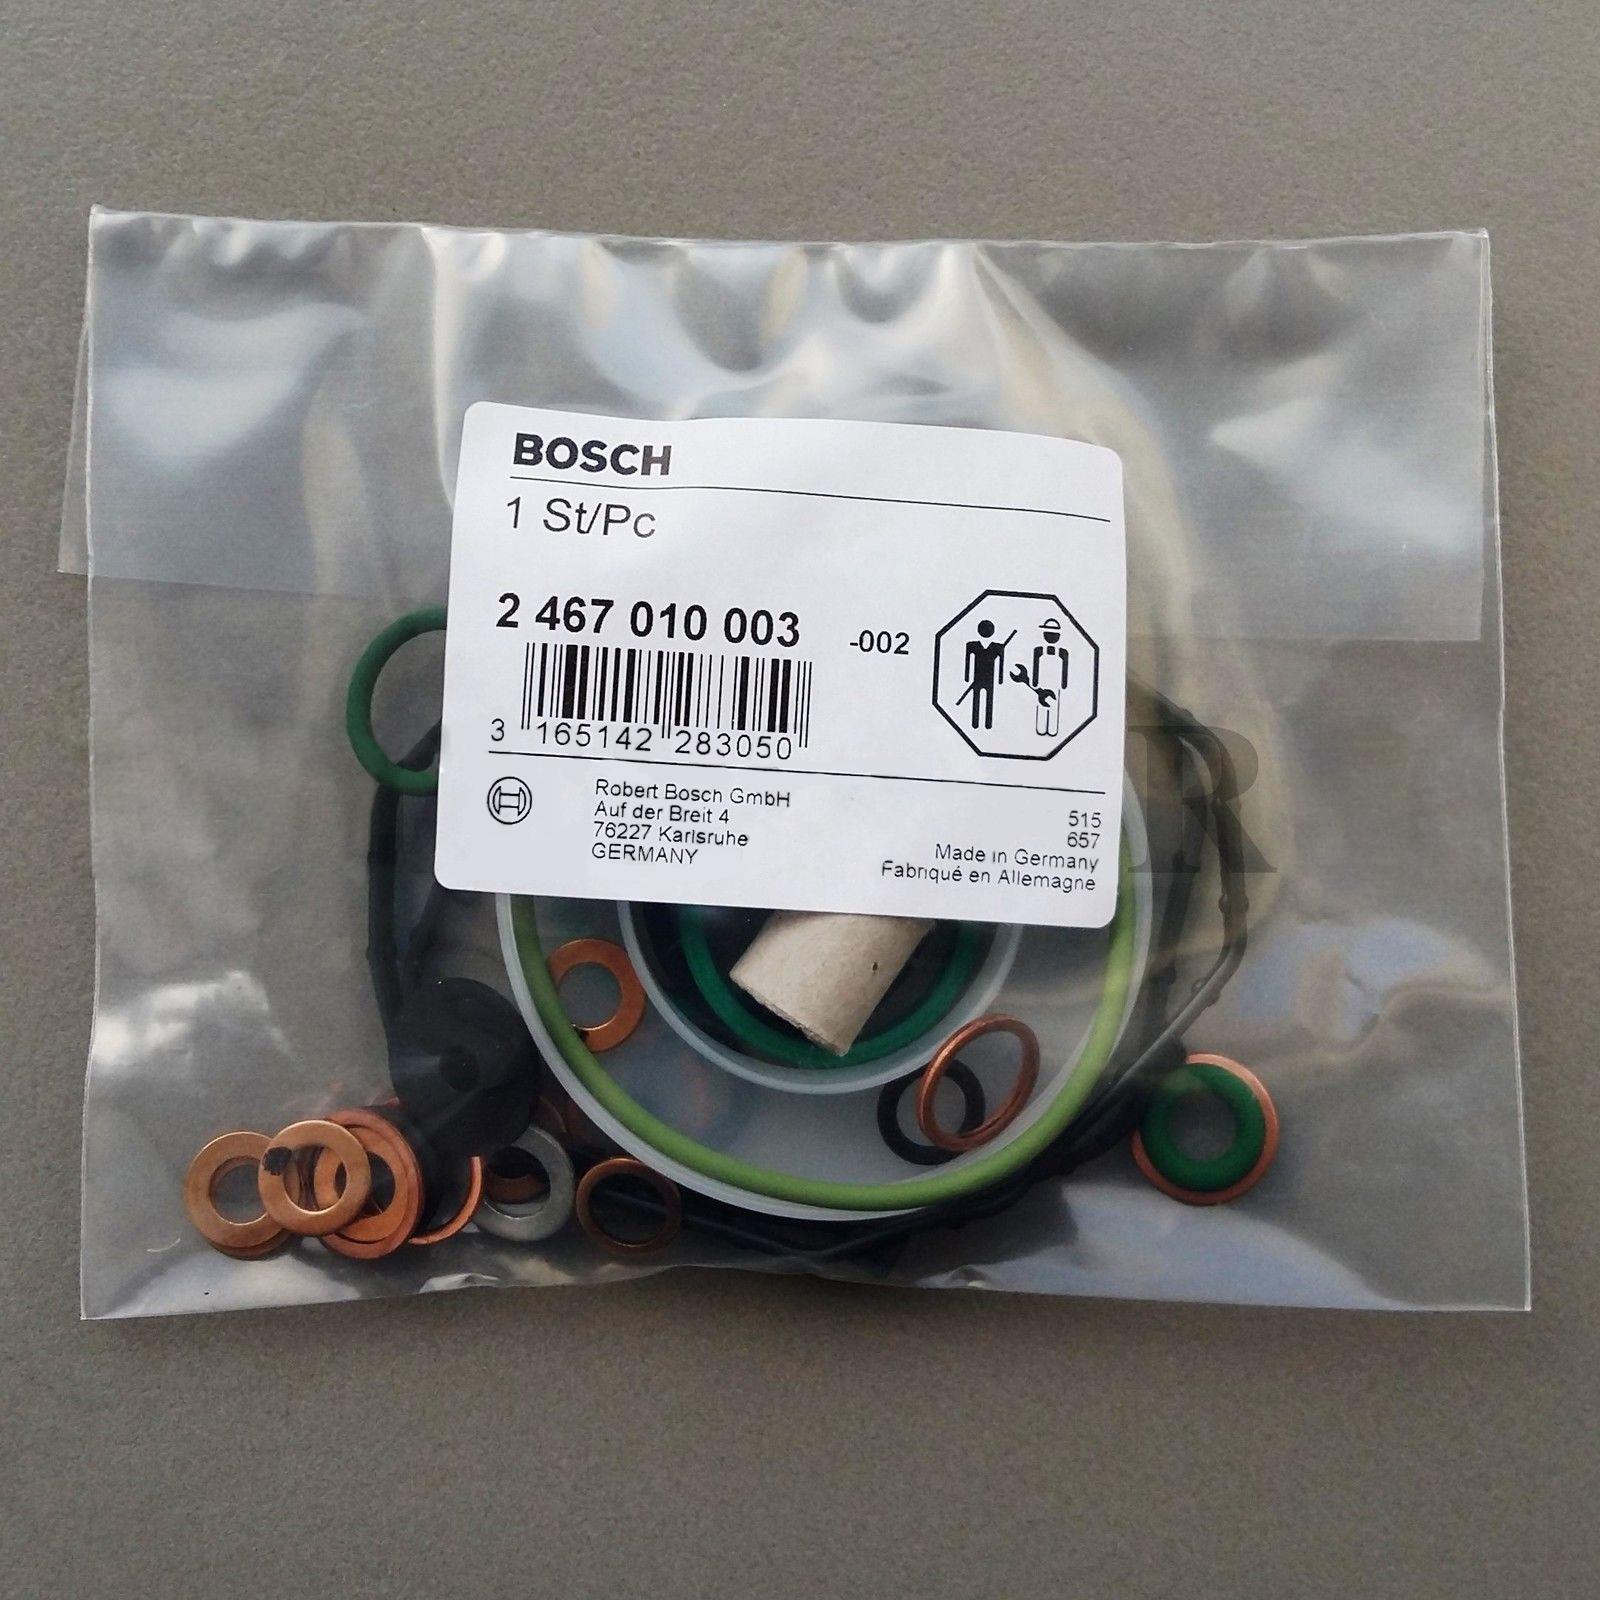 VW 1.9 TDI Diesel Injection Pump Seal Kit O-Rings Gaskets BOSCH Made in Germany